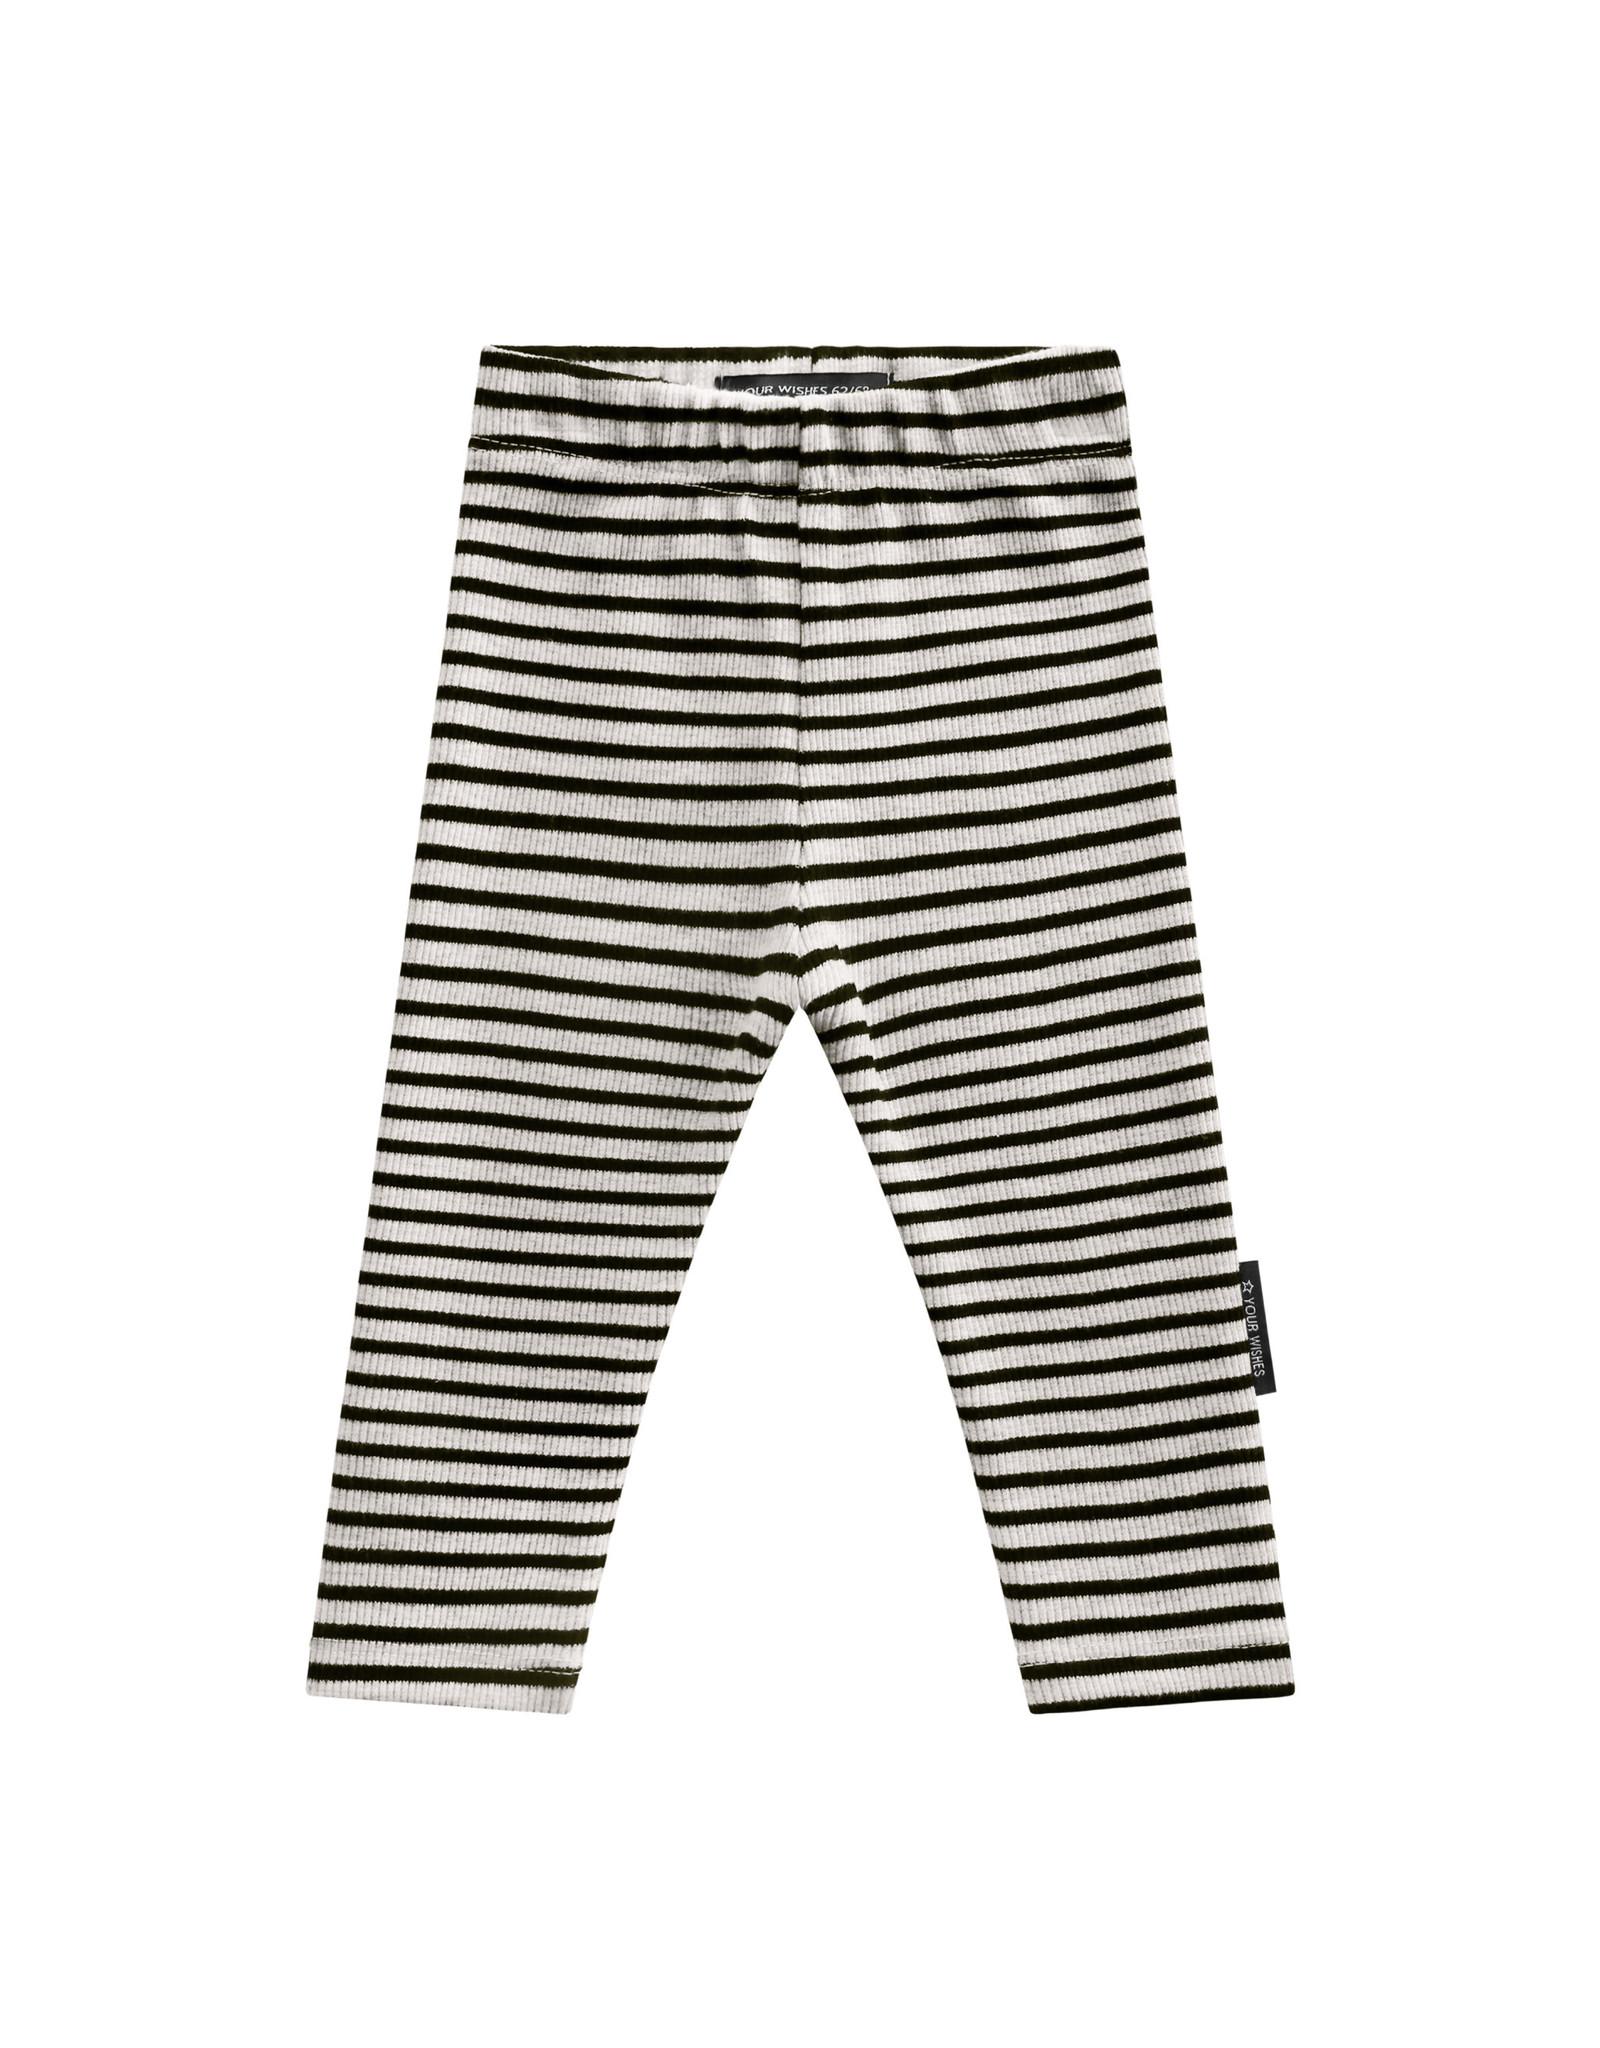 Your Wishes Beige - Stripes | Legging Chalk